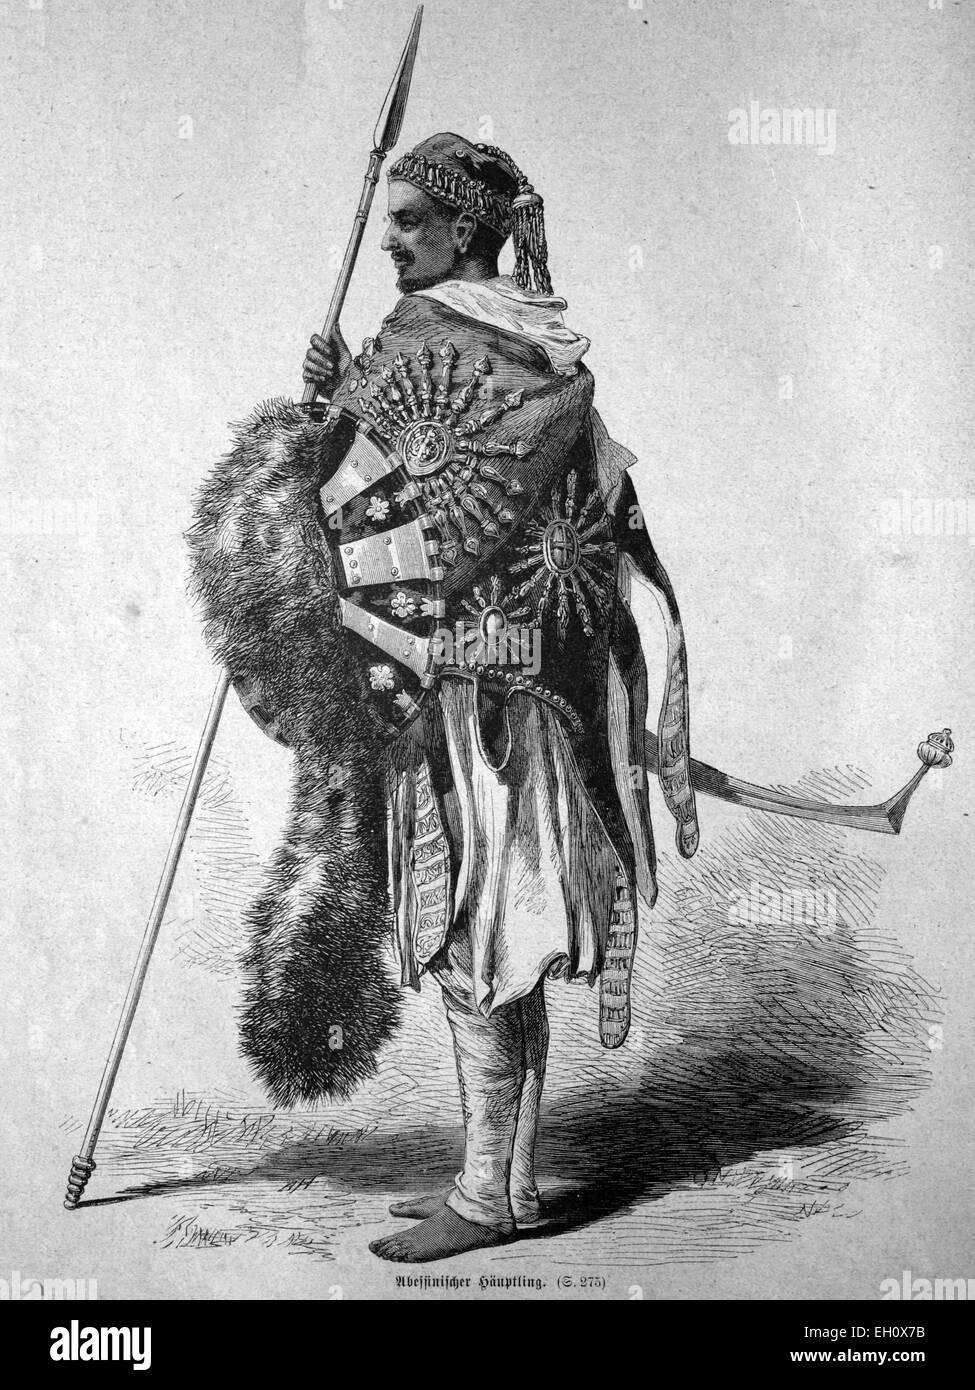 Abyssinian chieftain, Ethiopia, historical illustration, circa 1886 - Stock Image